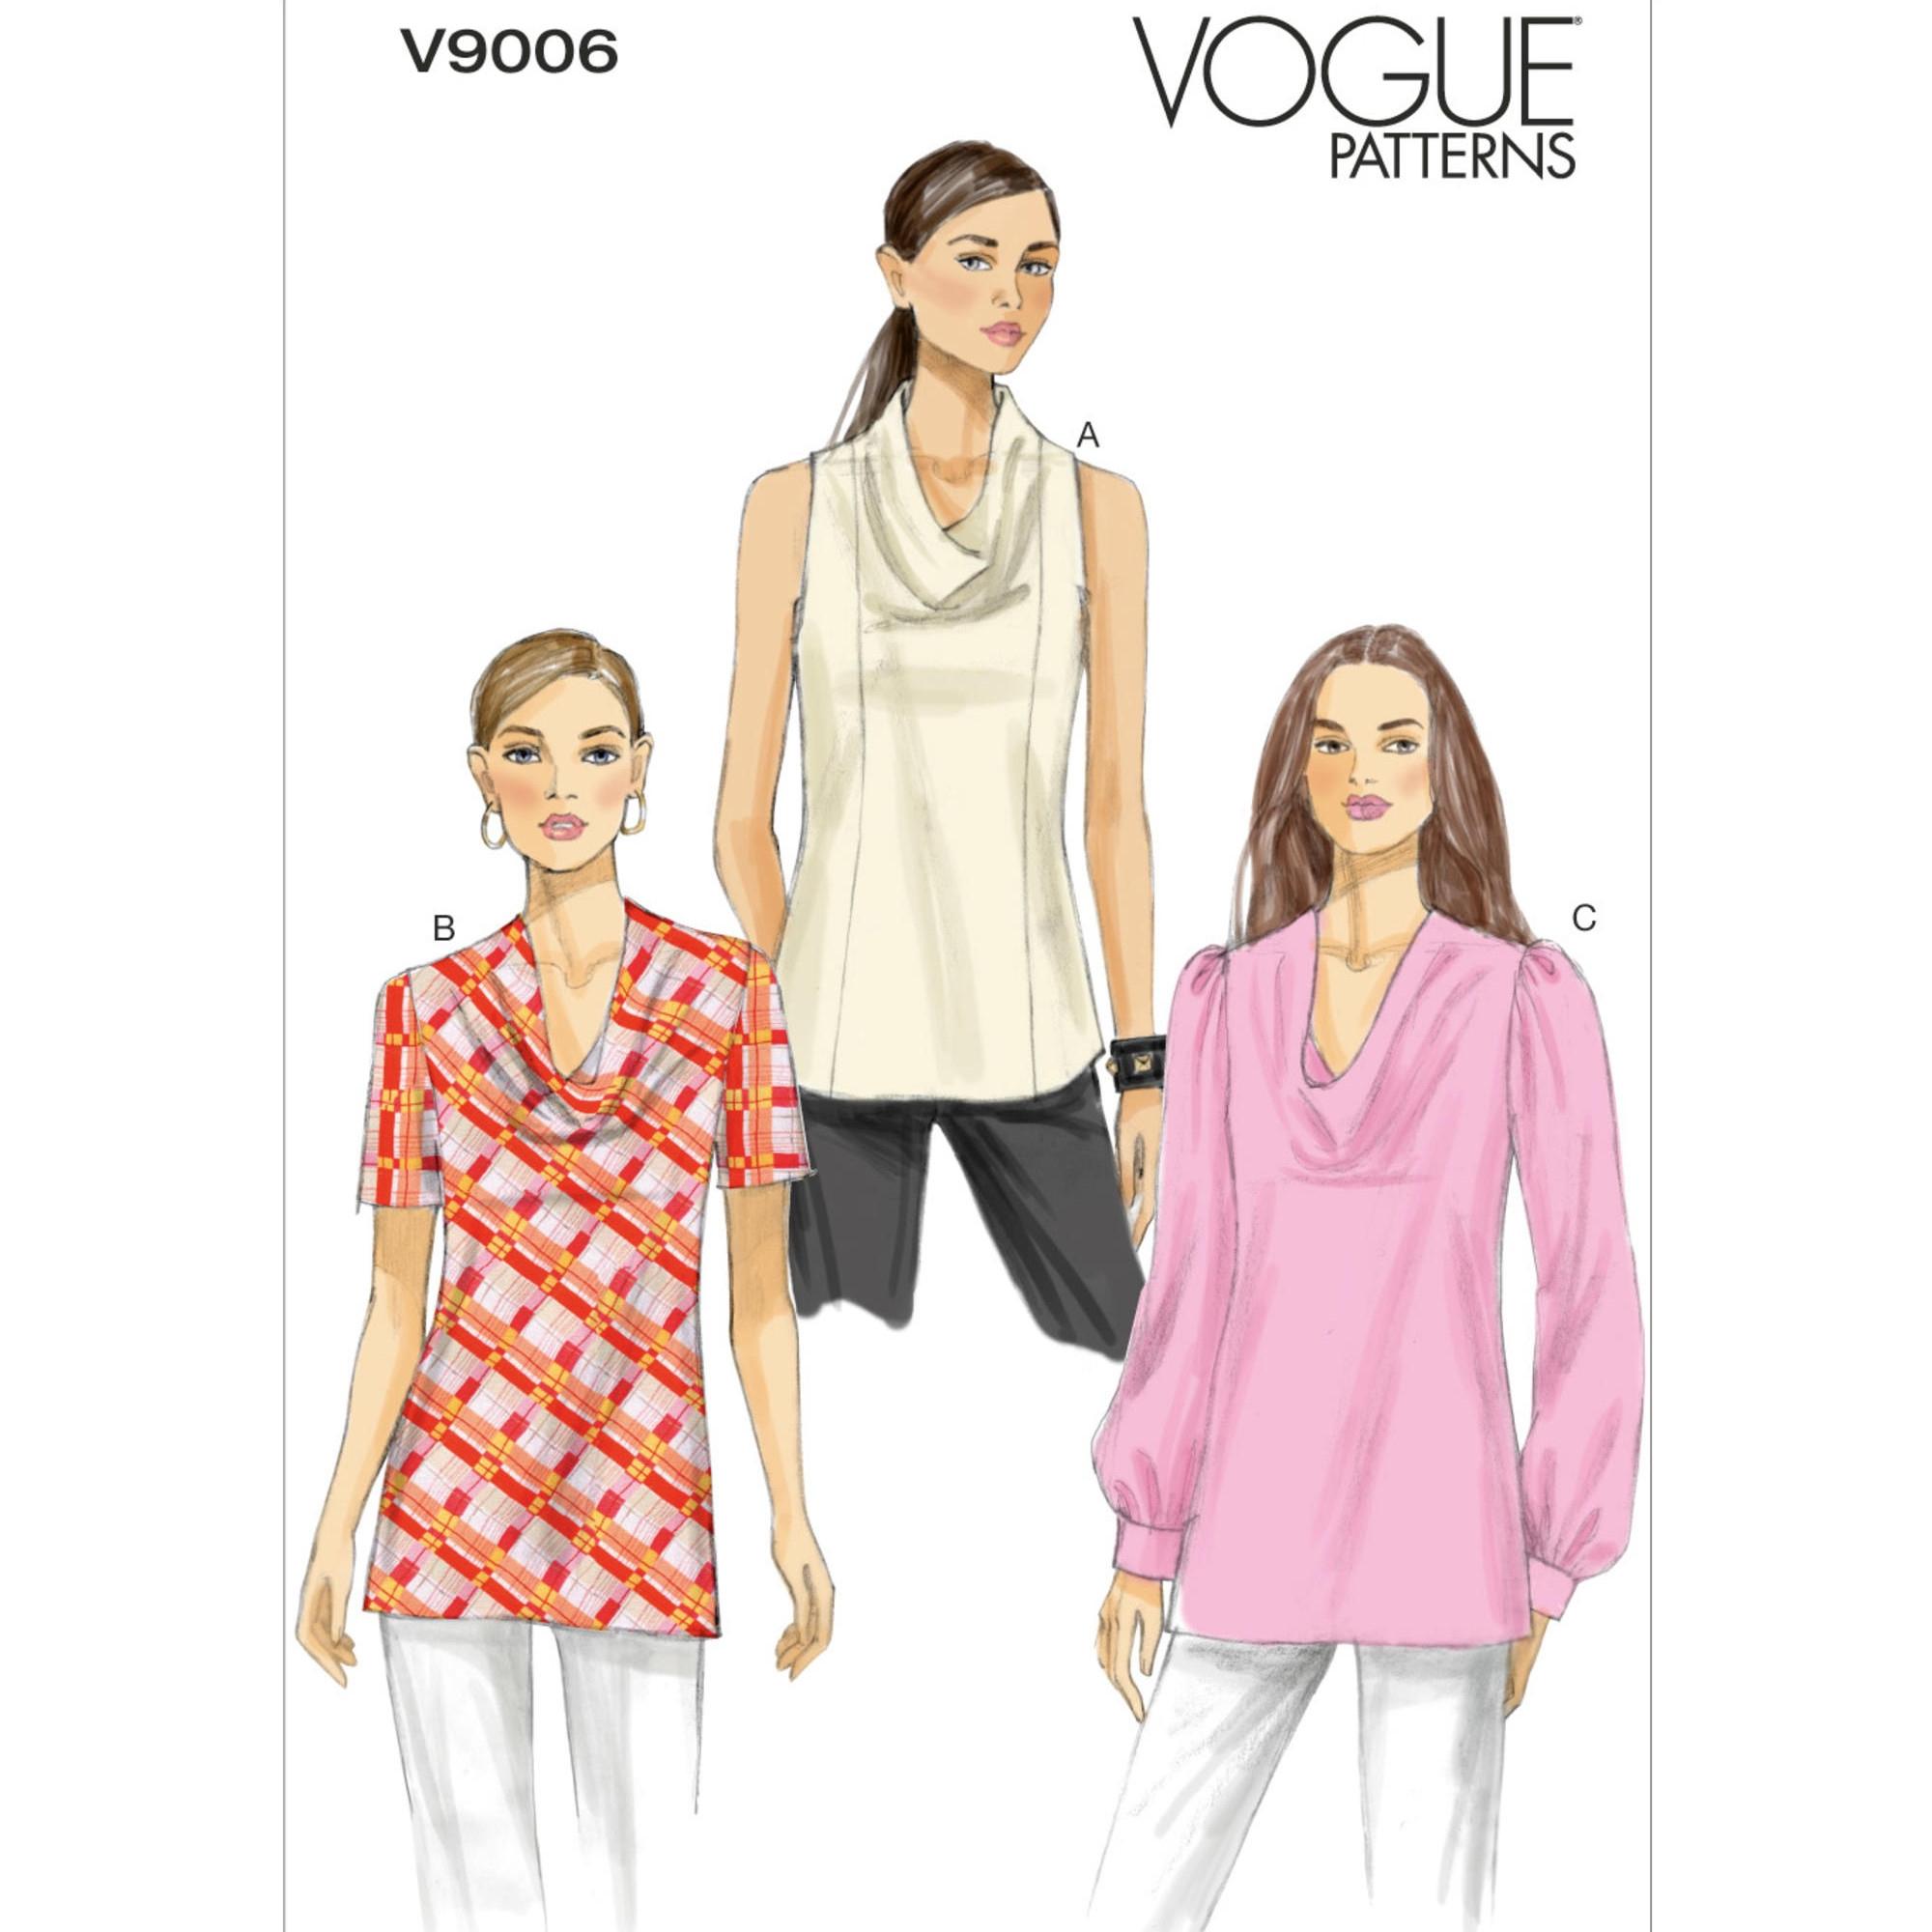 Schnittmuster Vogue 9006 Damen Top - Bluse | stoffe-hemmers.de